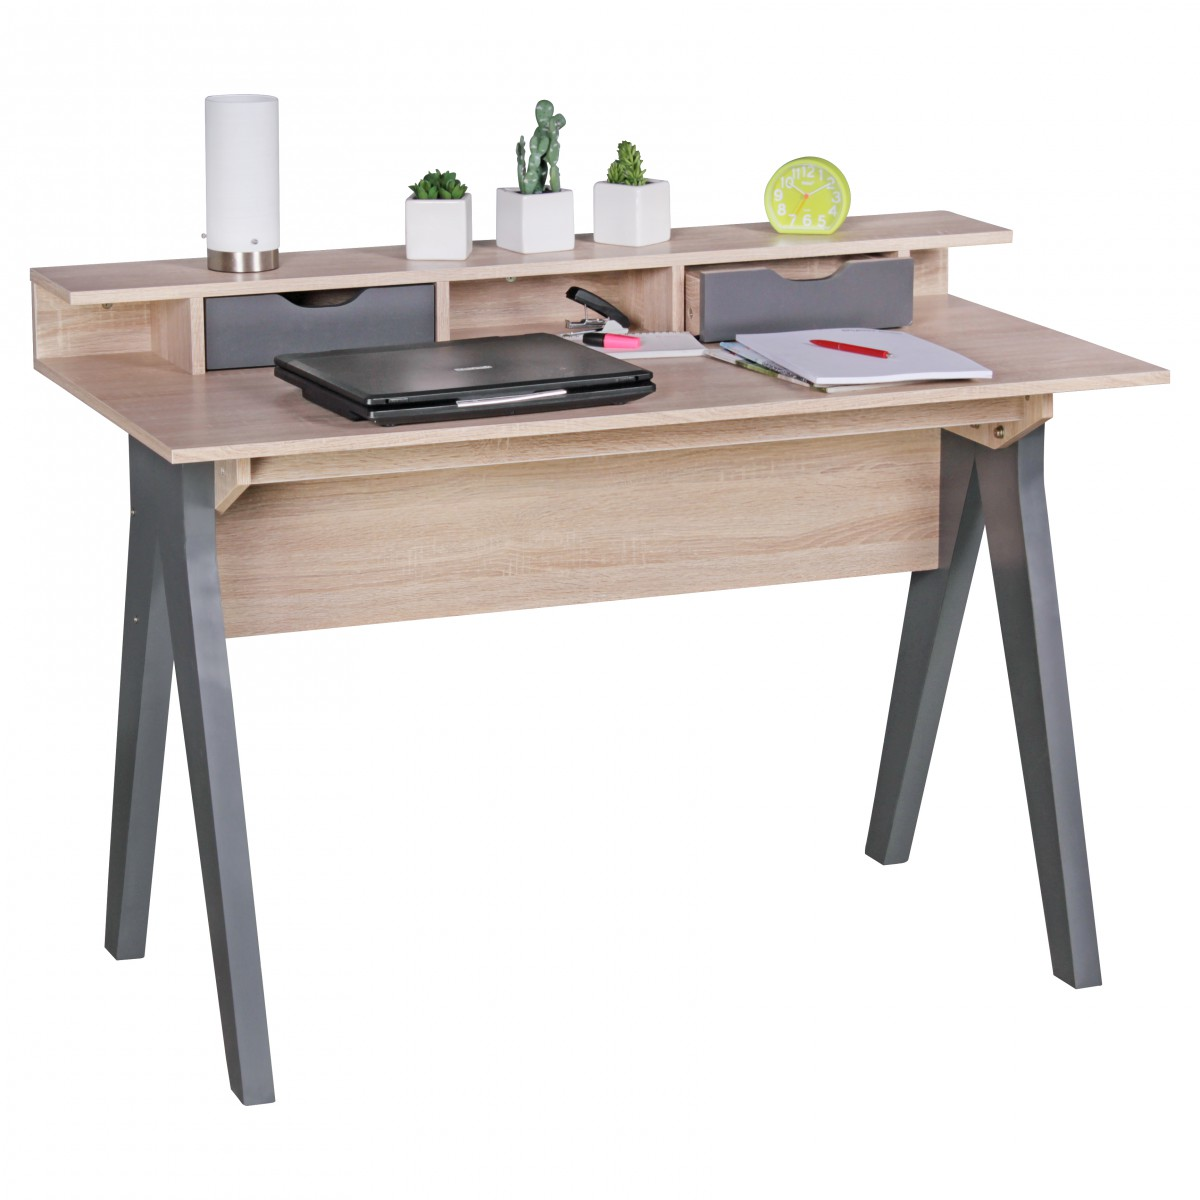 Psací stůl Samo, 120 cm, Sonoma dub/šedá